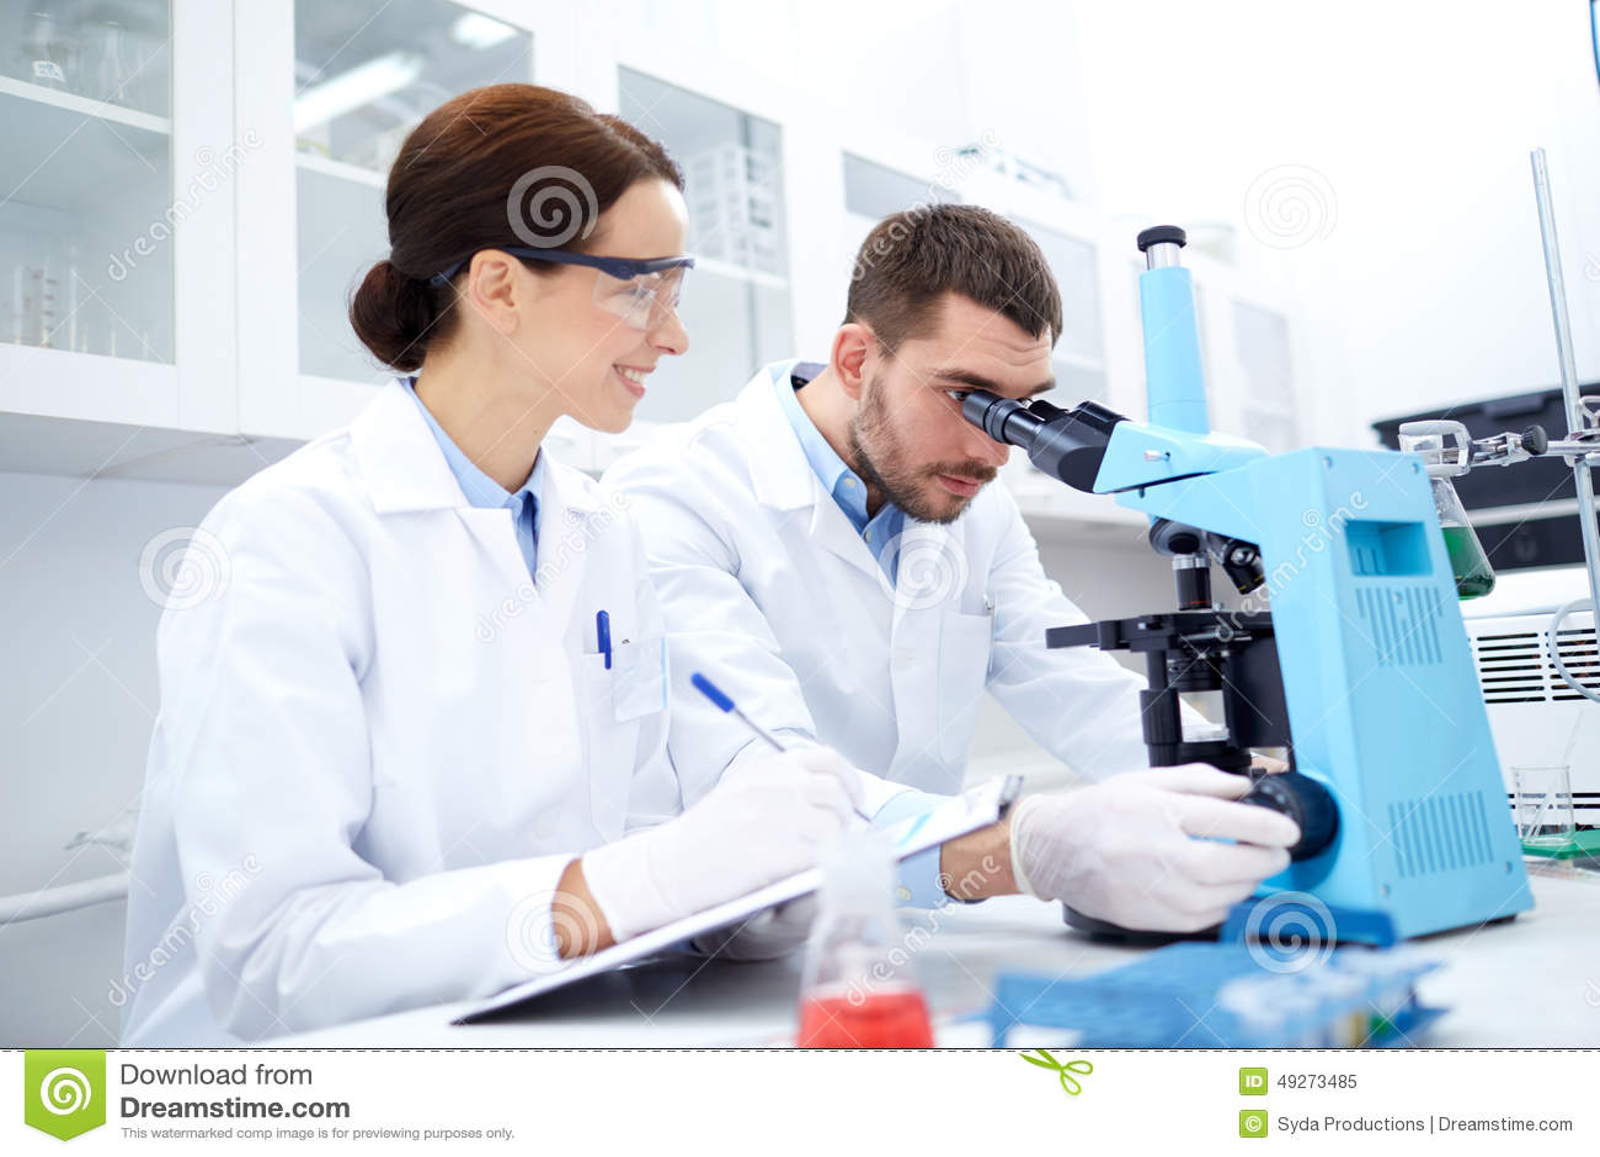 science departments chemistry people